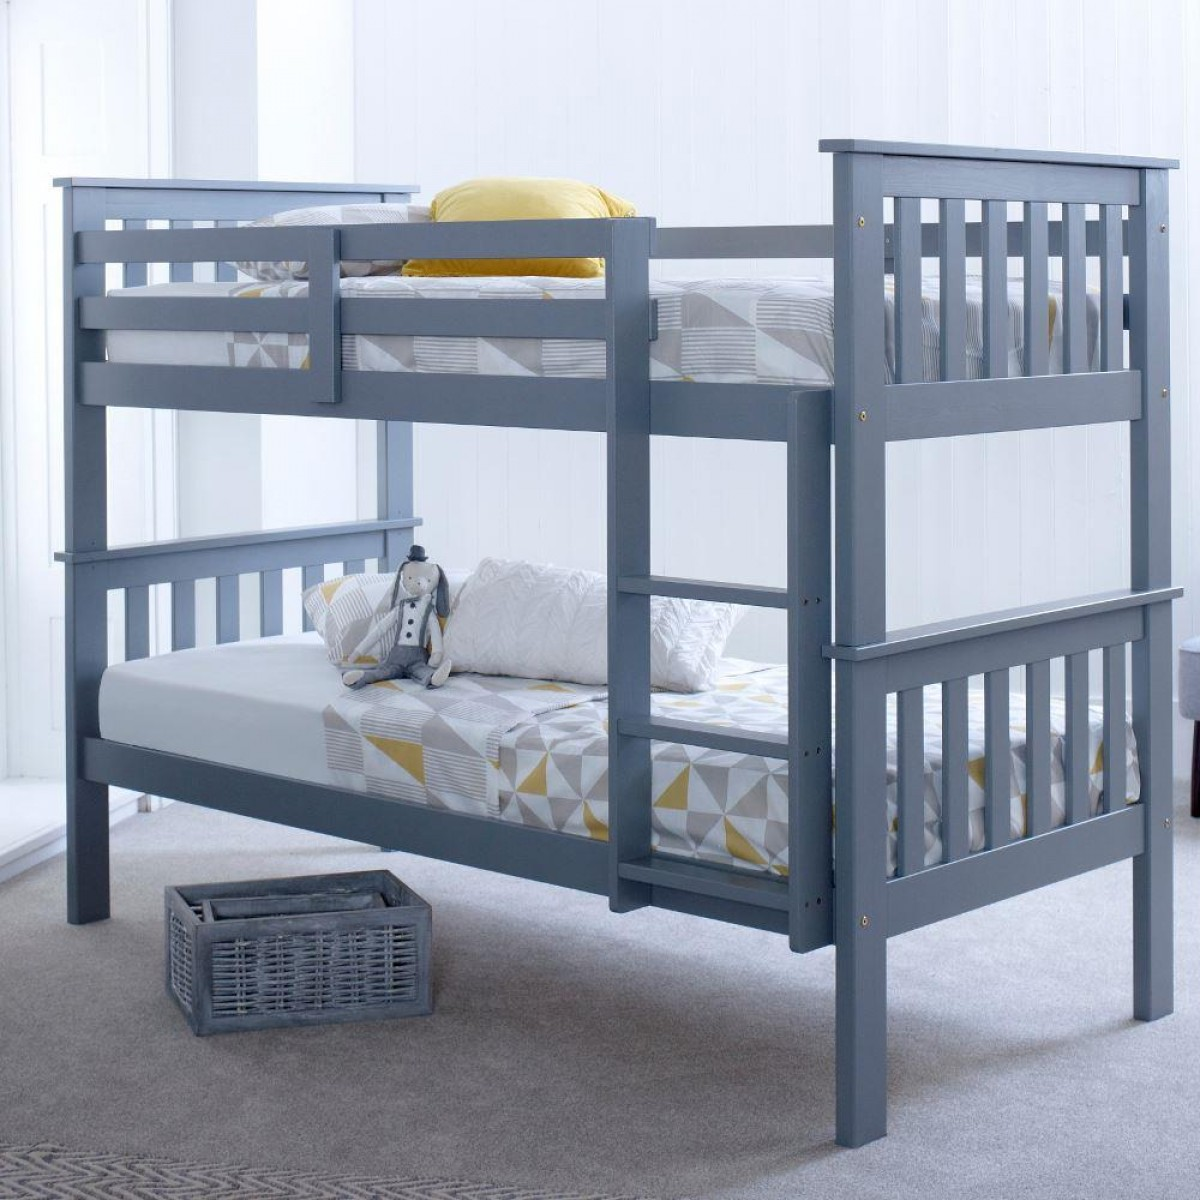 Groovy Atlantis Grey Wooden Bunk Bed Frame Machost Co Dining Chair Design Ideas Machostcouk